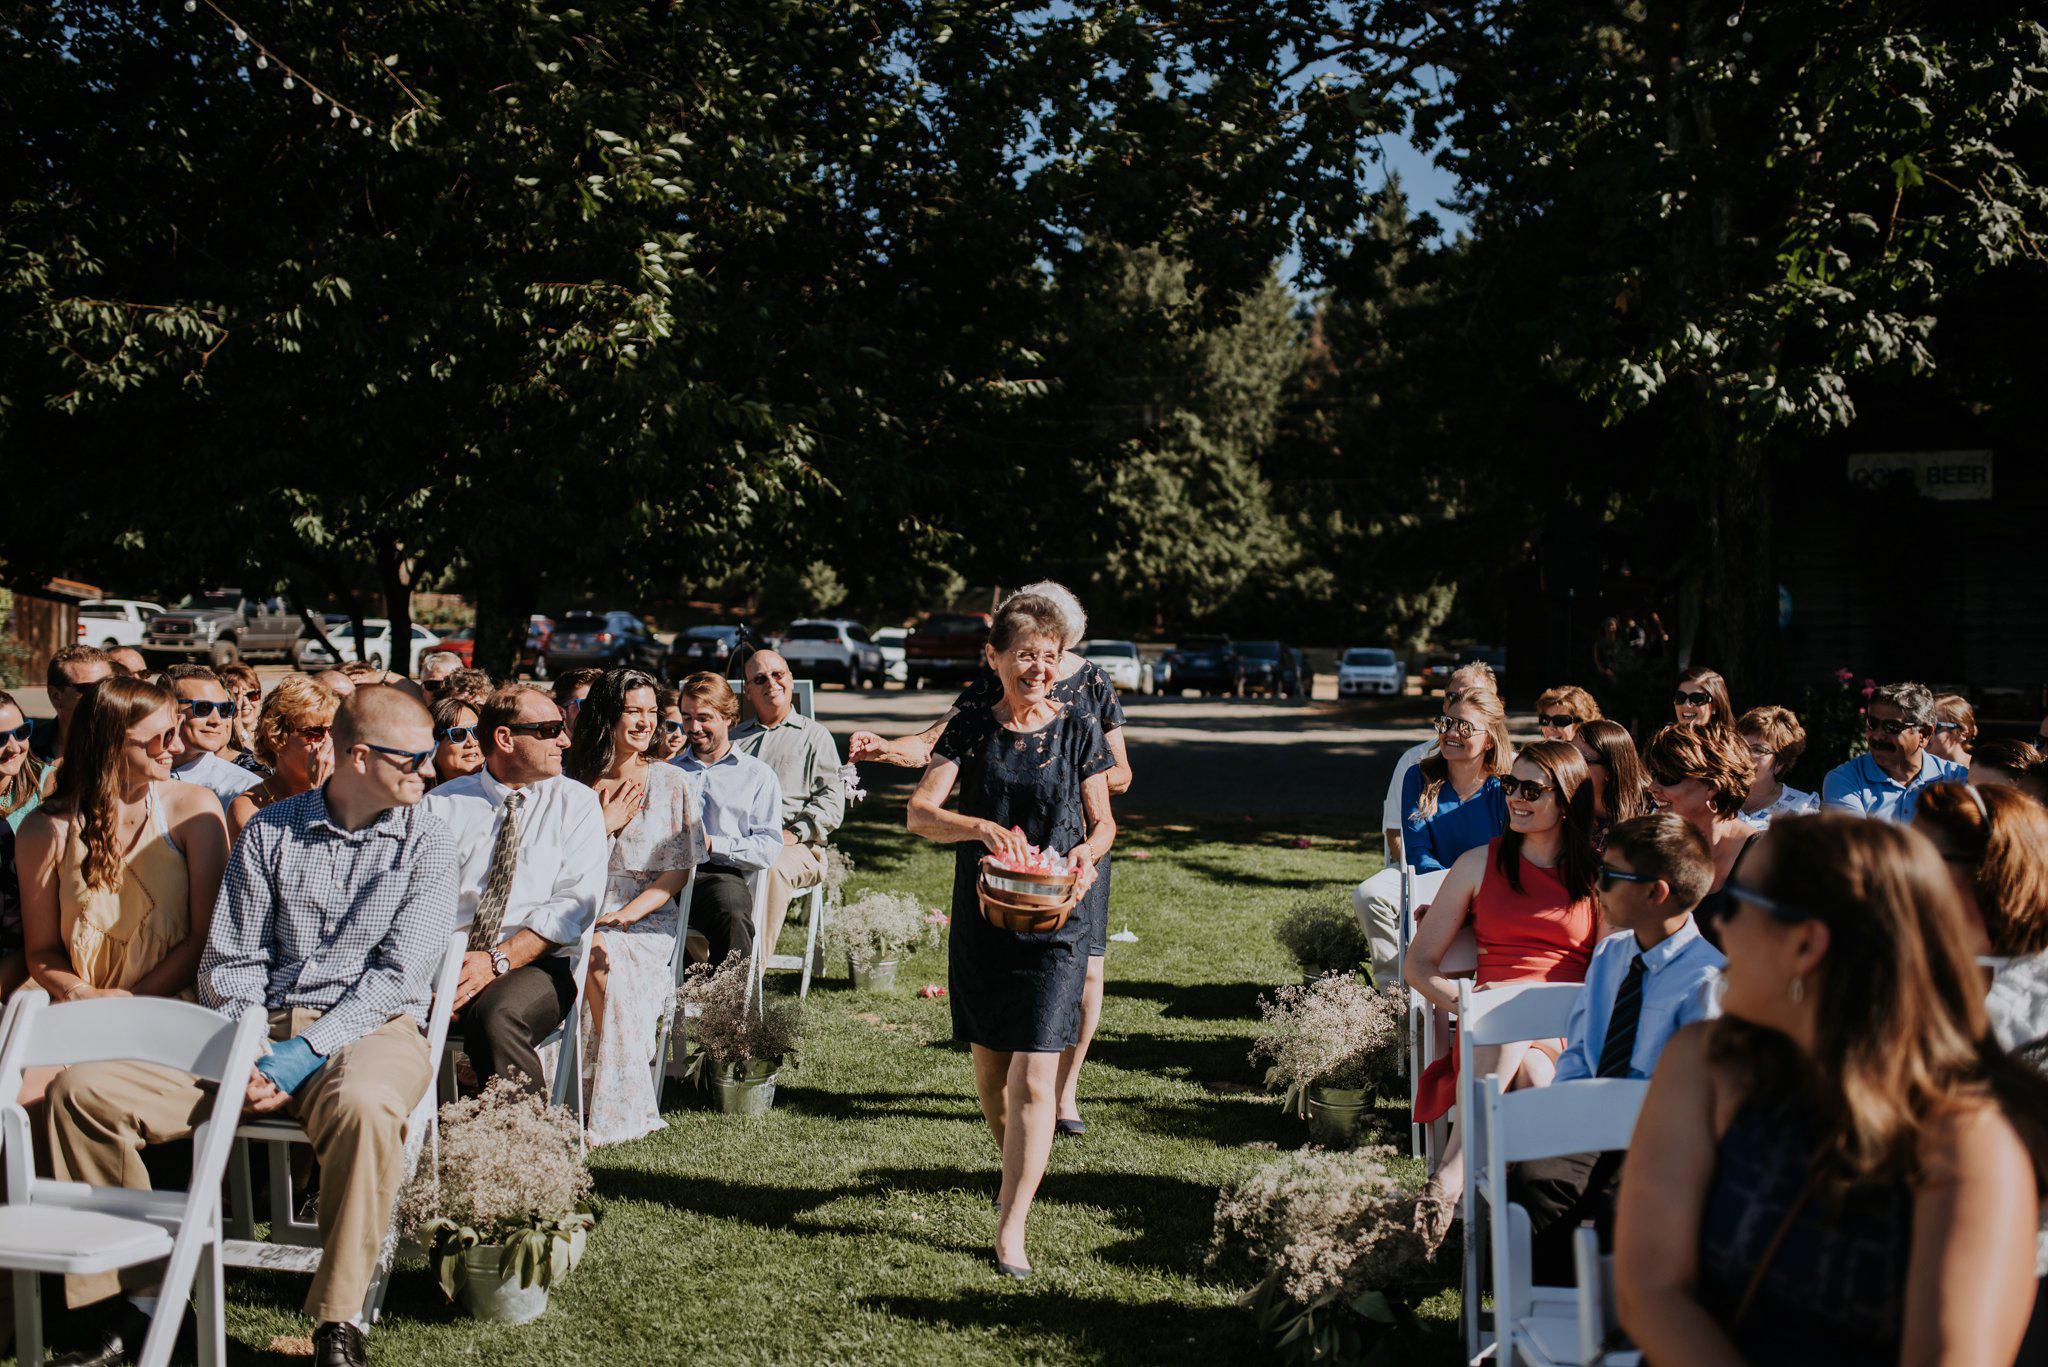 kristen-and-cody-the-kelley-farm-wedding-seattle-photographer-caitlyn-nikula-59.jpg